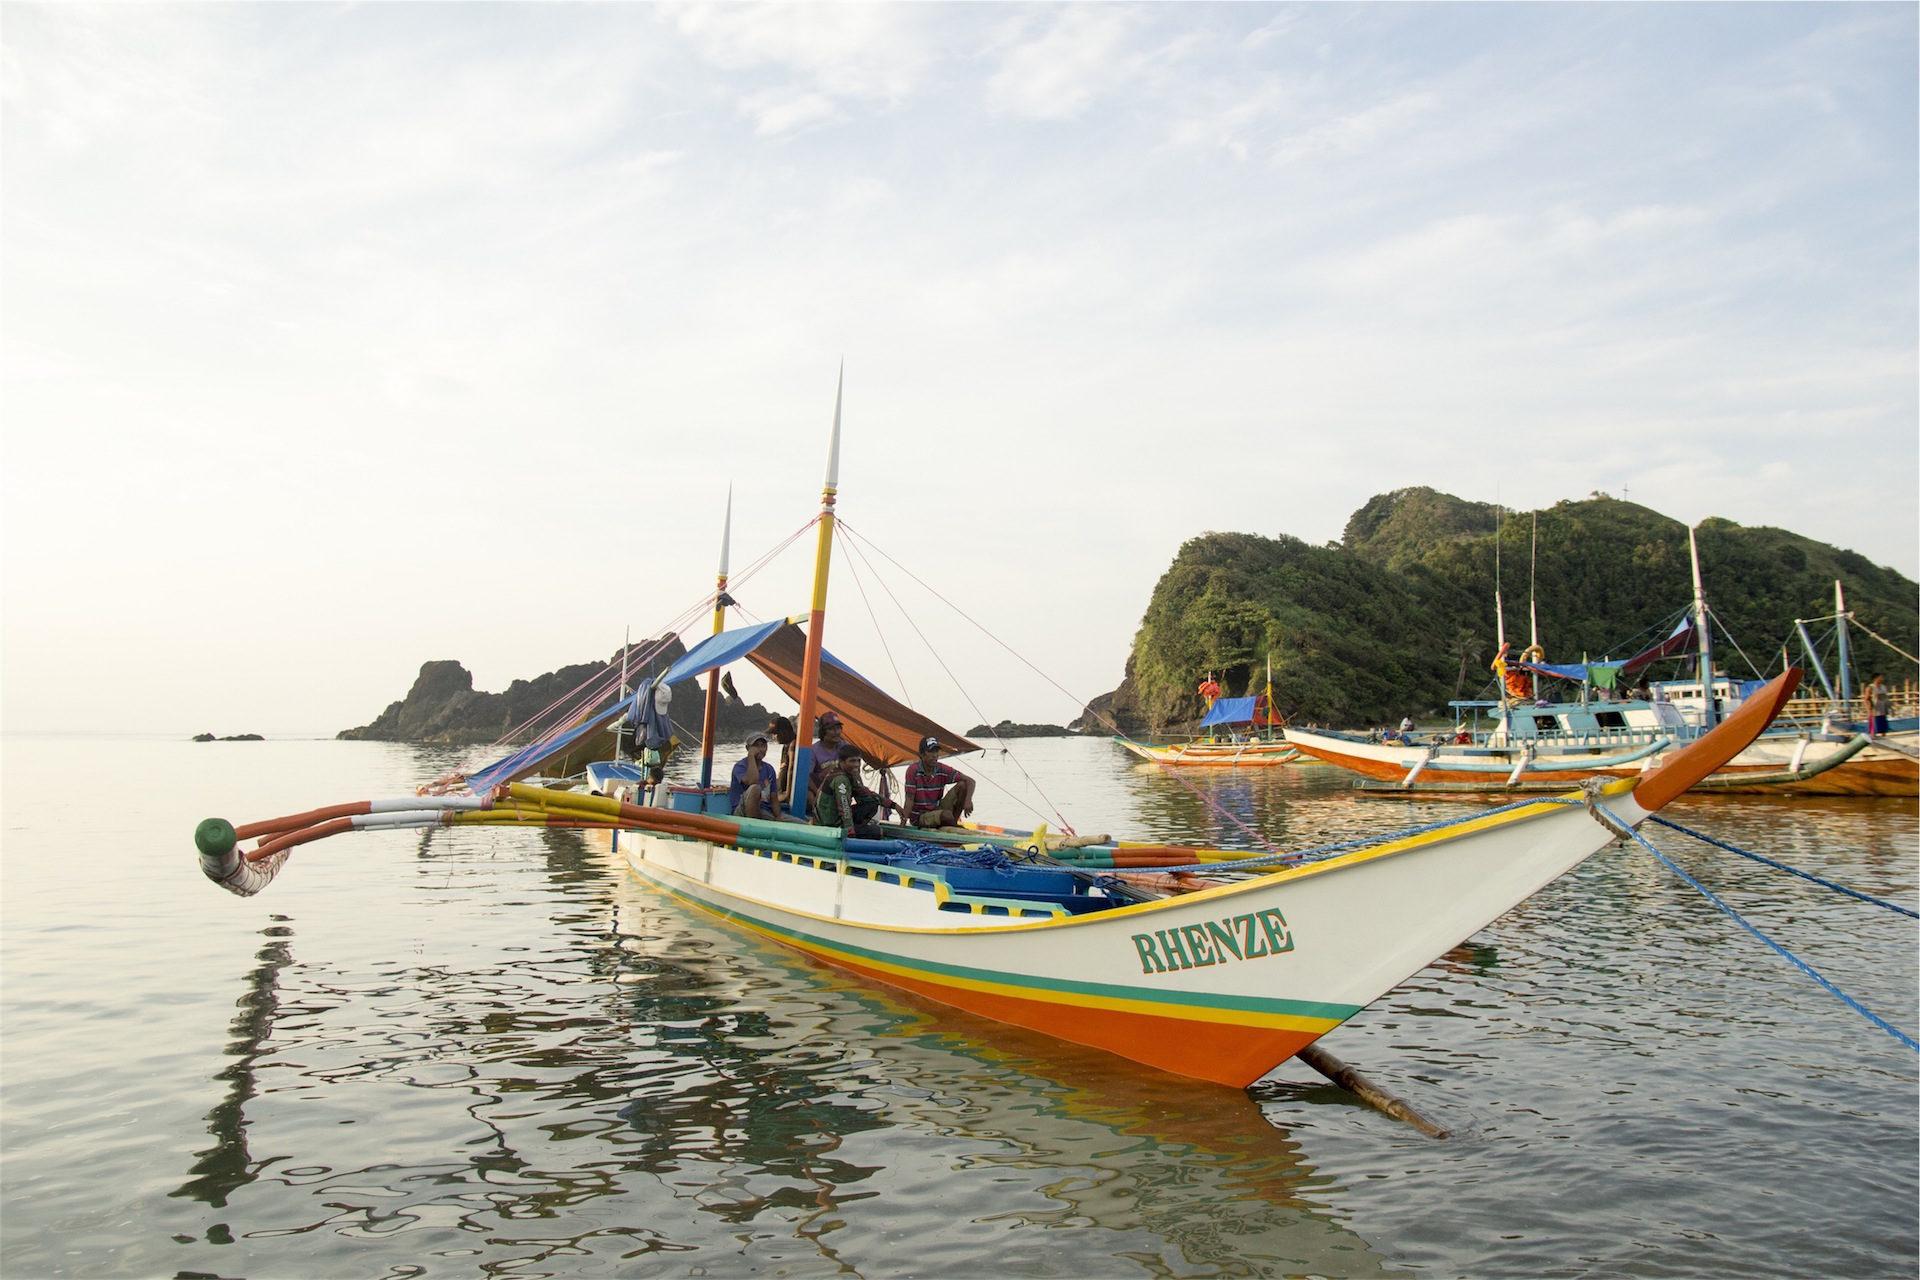 Барка, Порт, Туризм, Море, Обзор - Обои HD - Профессор falken.com